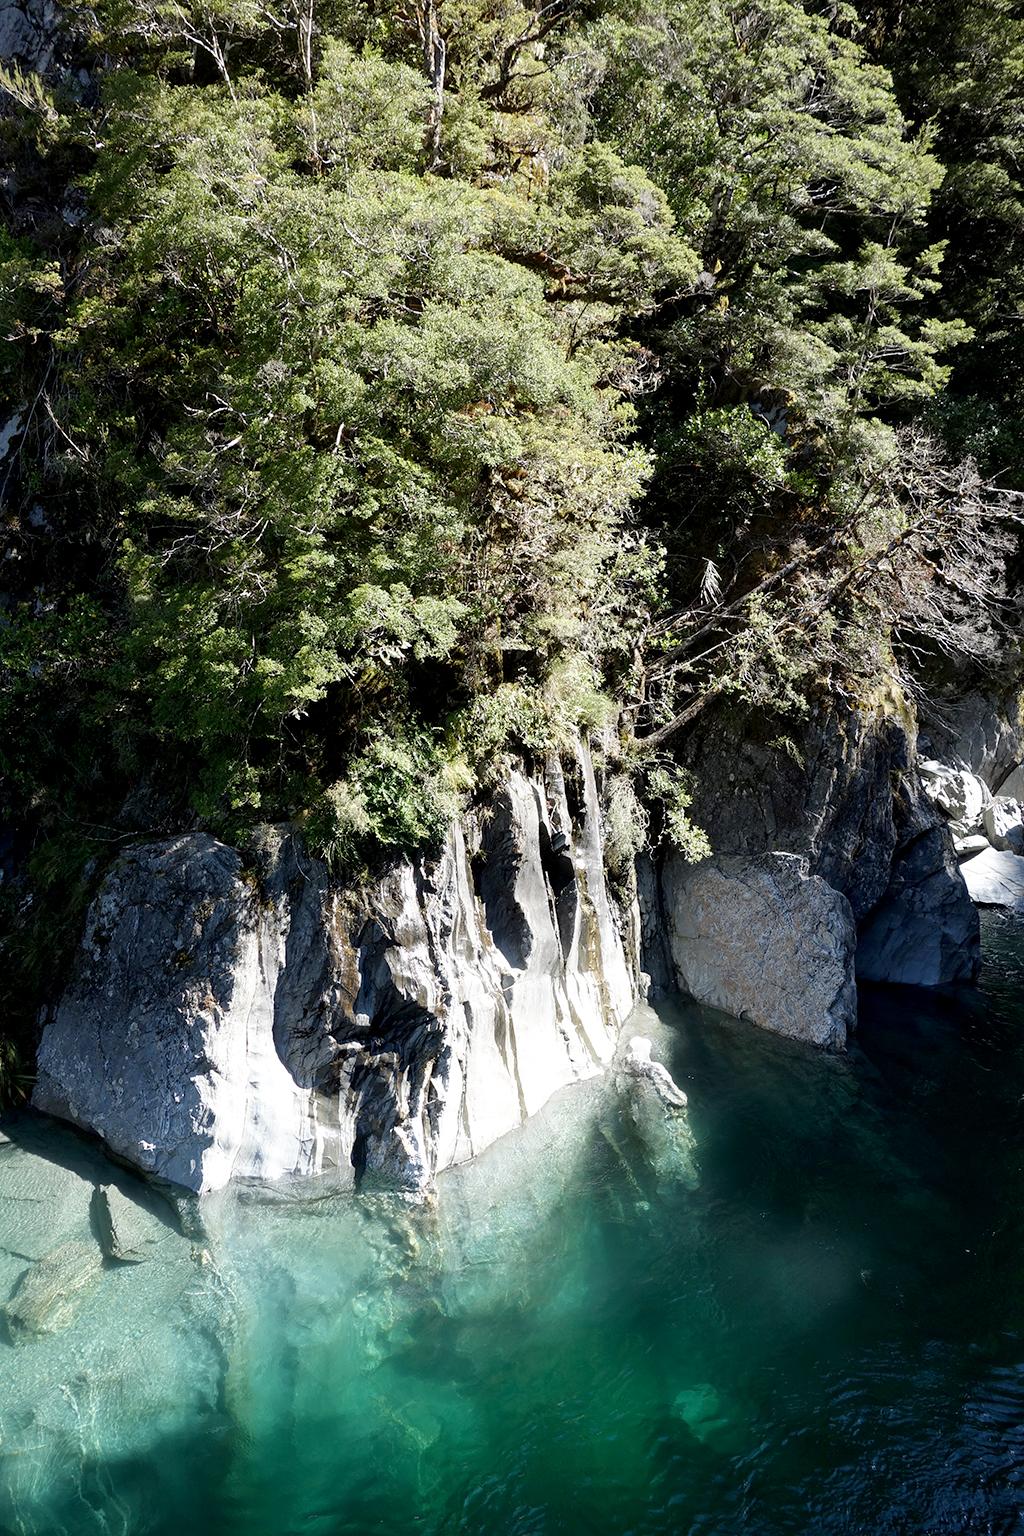 Blue Pool canyon, New Zealand